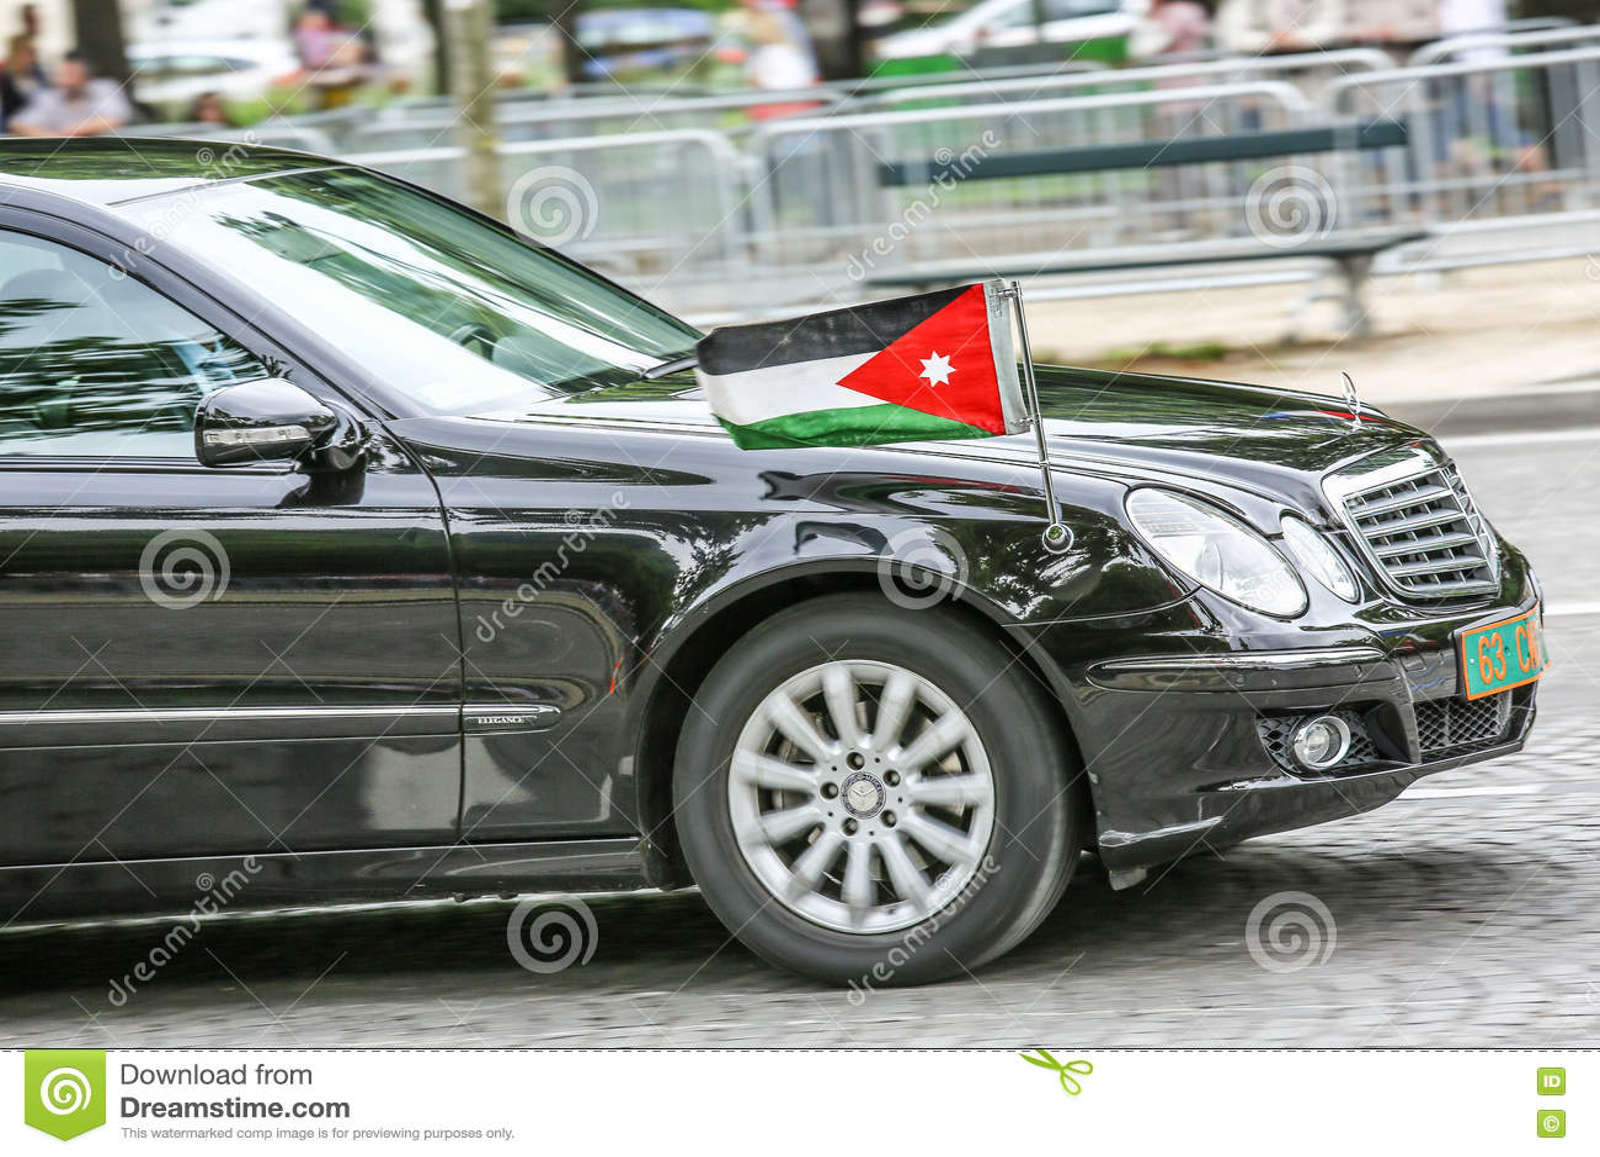 Carro diplomático jordano durante a parada militar ( Defile) no dia ( da república; Bastille Day) Campeões Ely